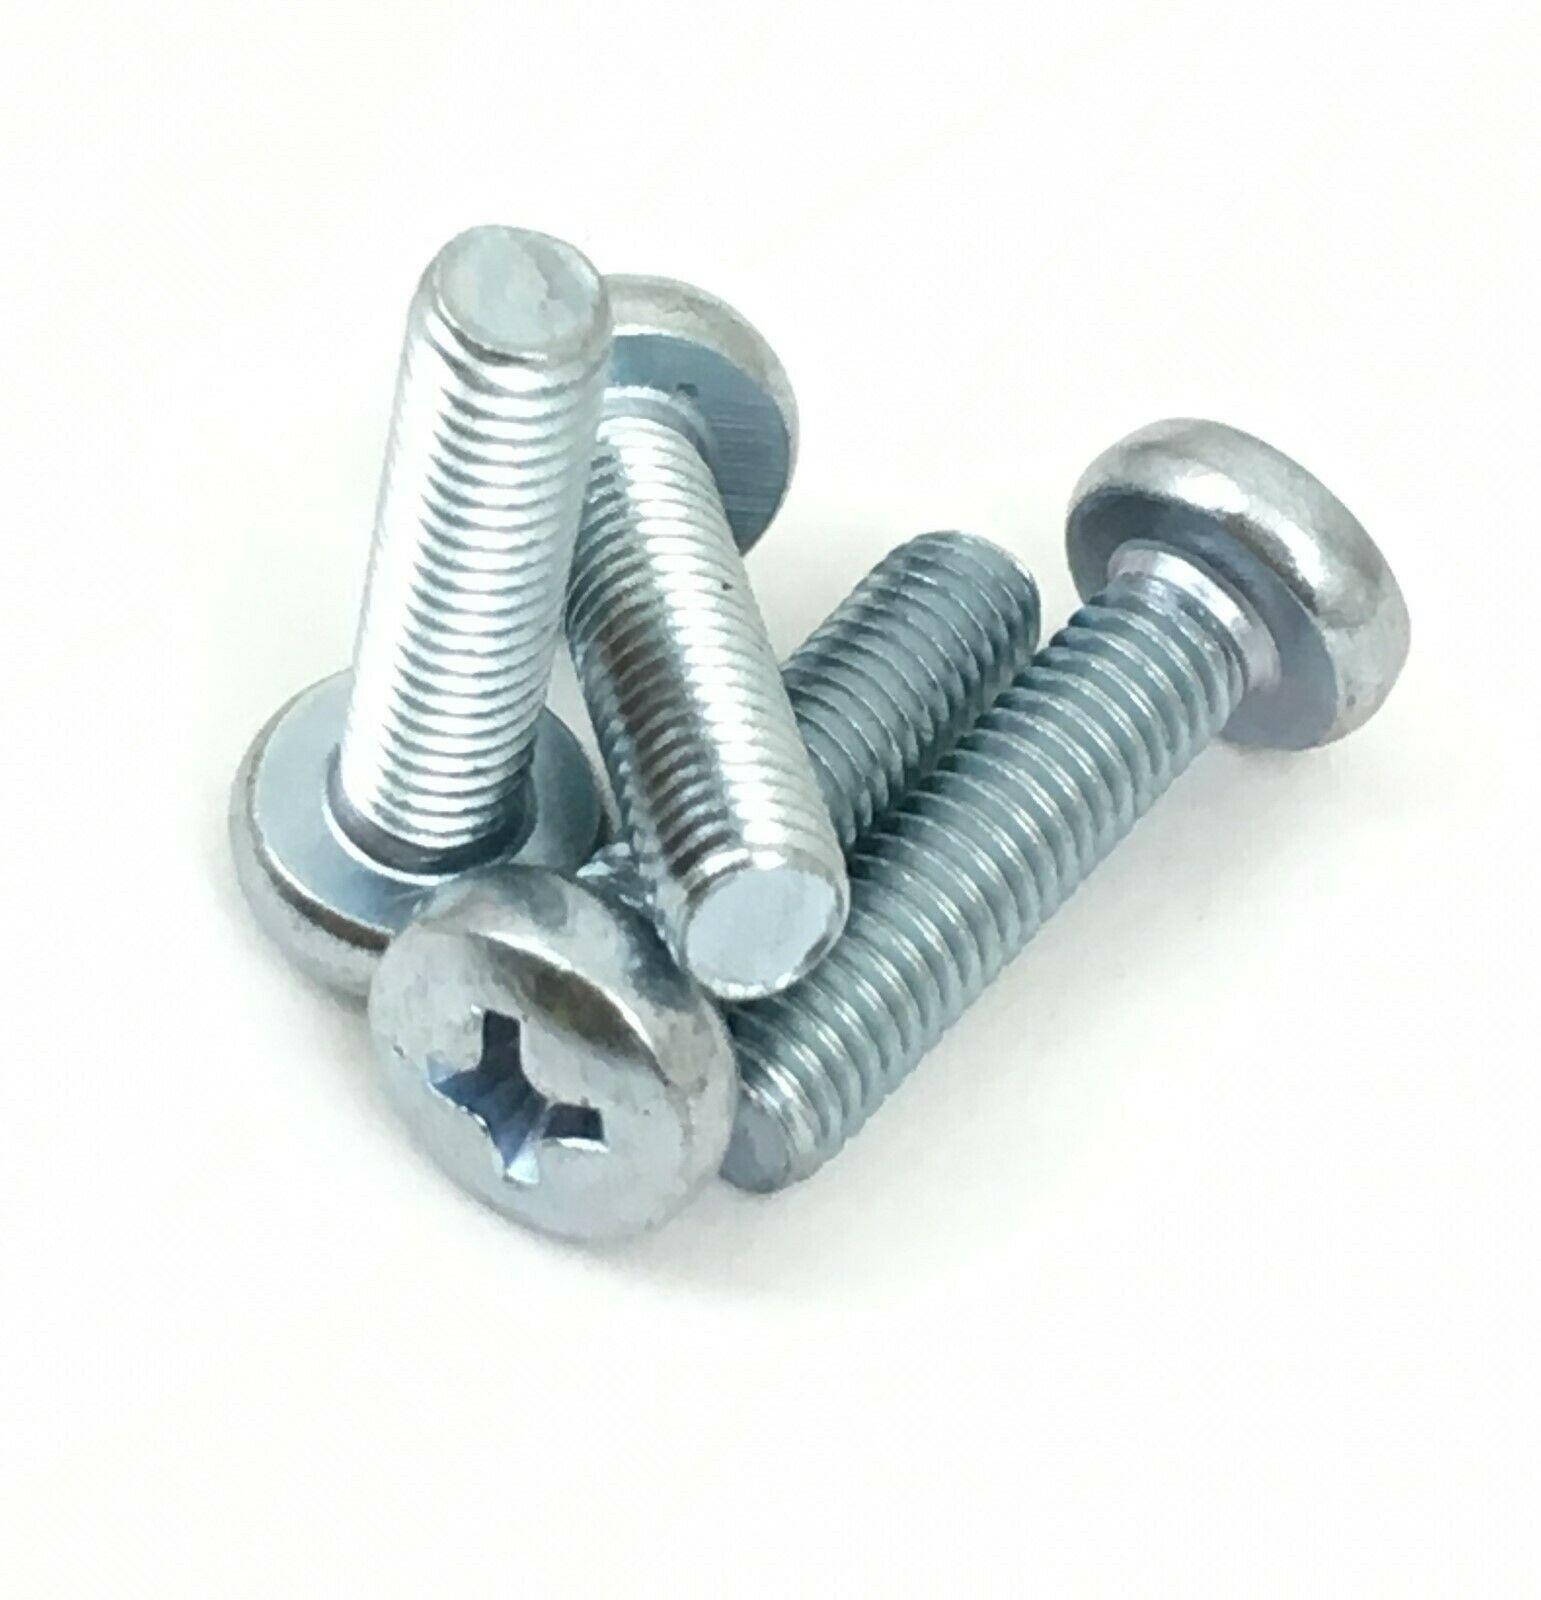 ReplacementScrews Stand Screws for Vizio M65-E0